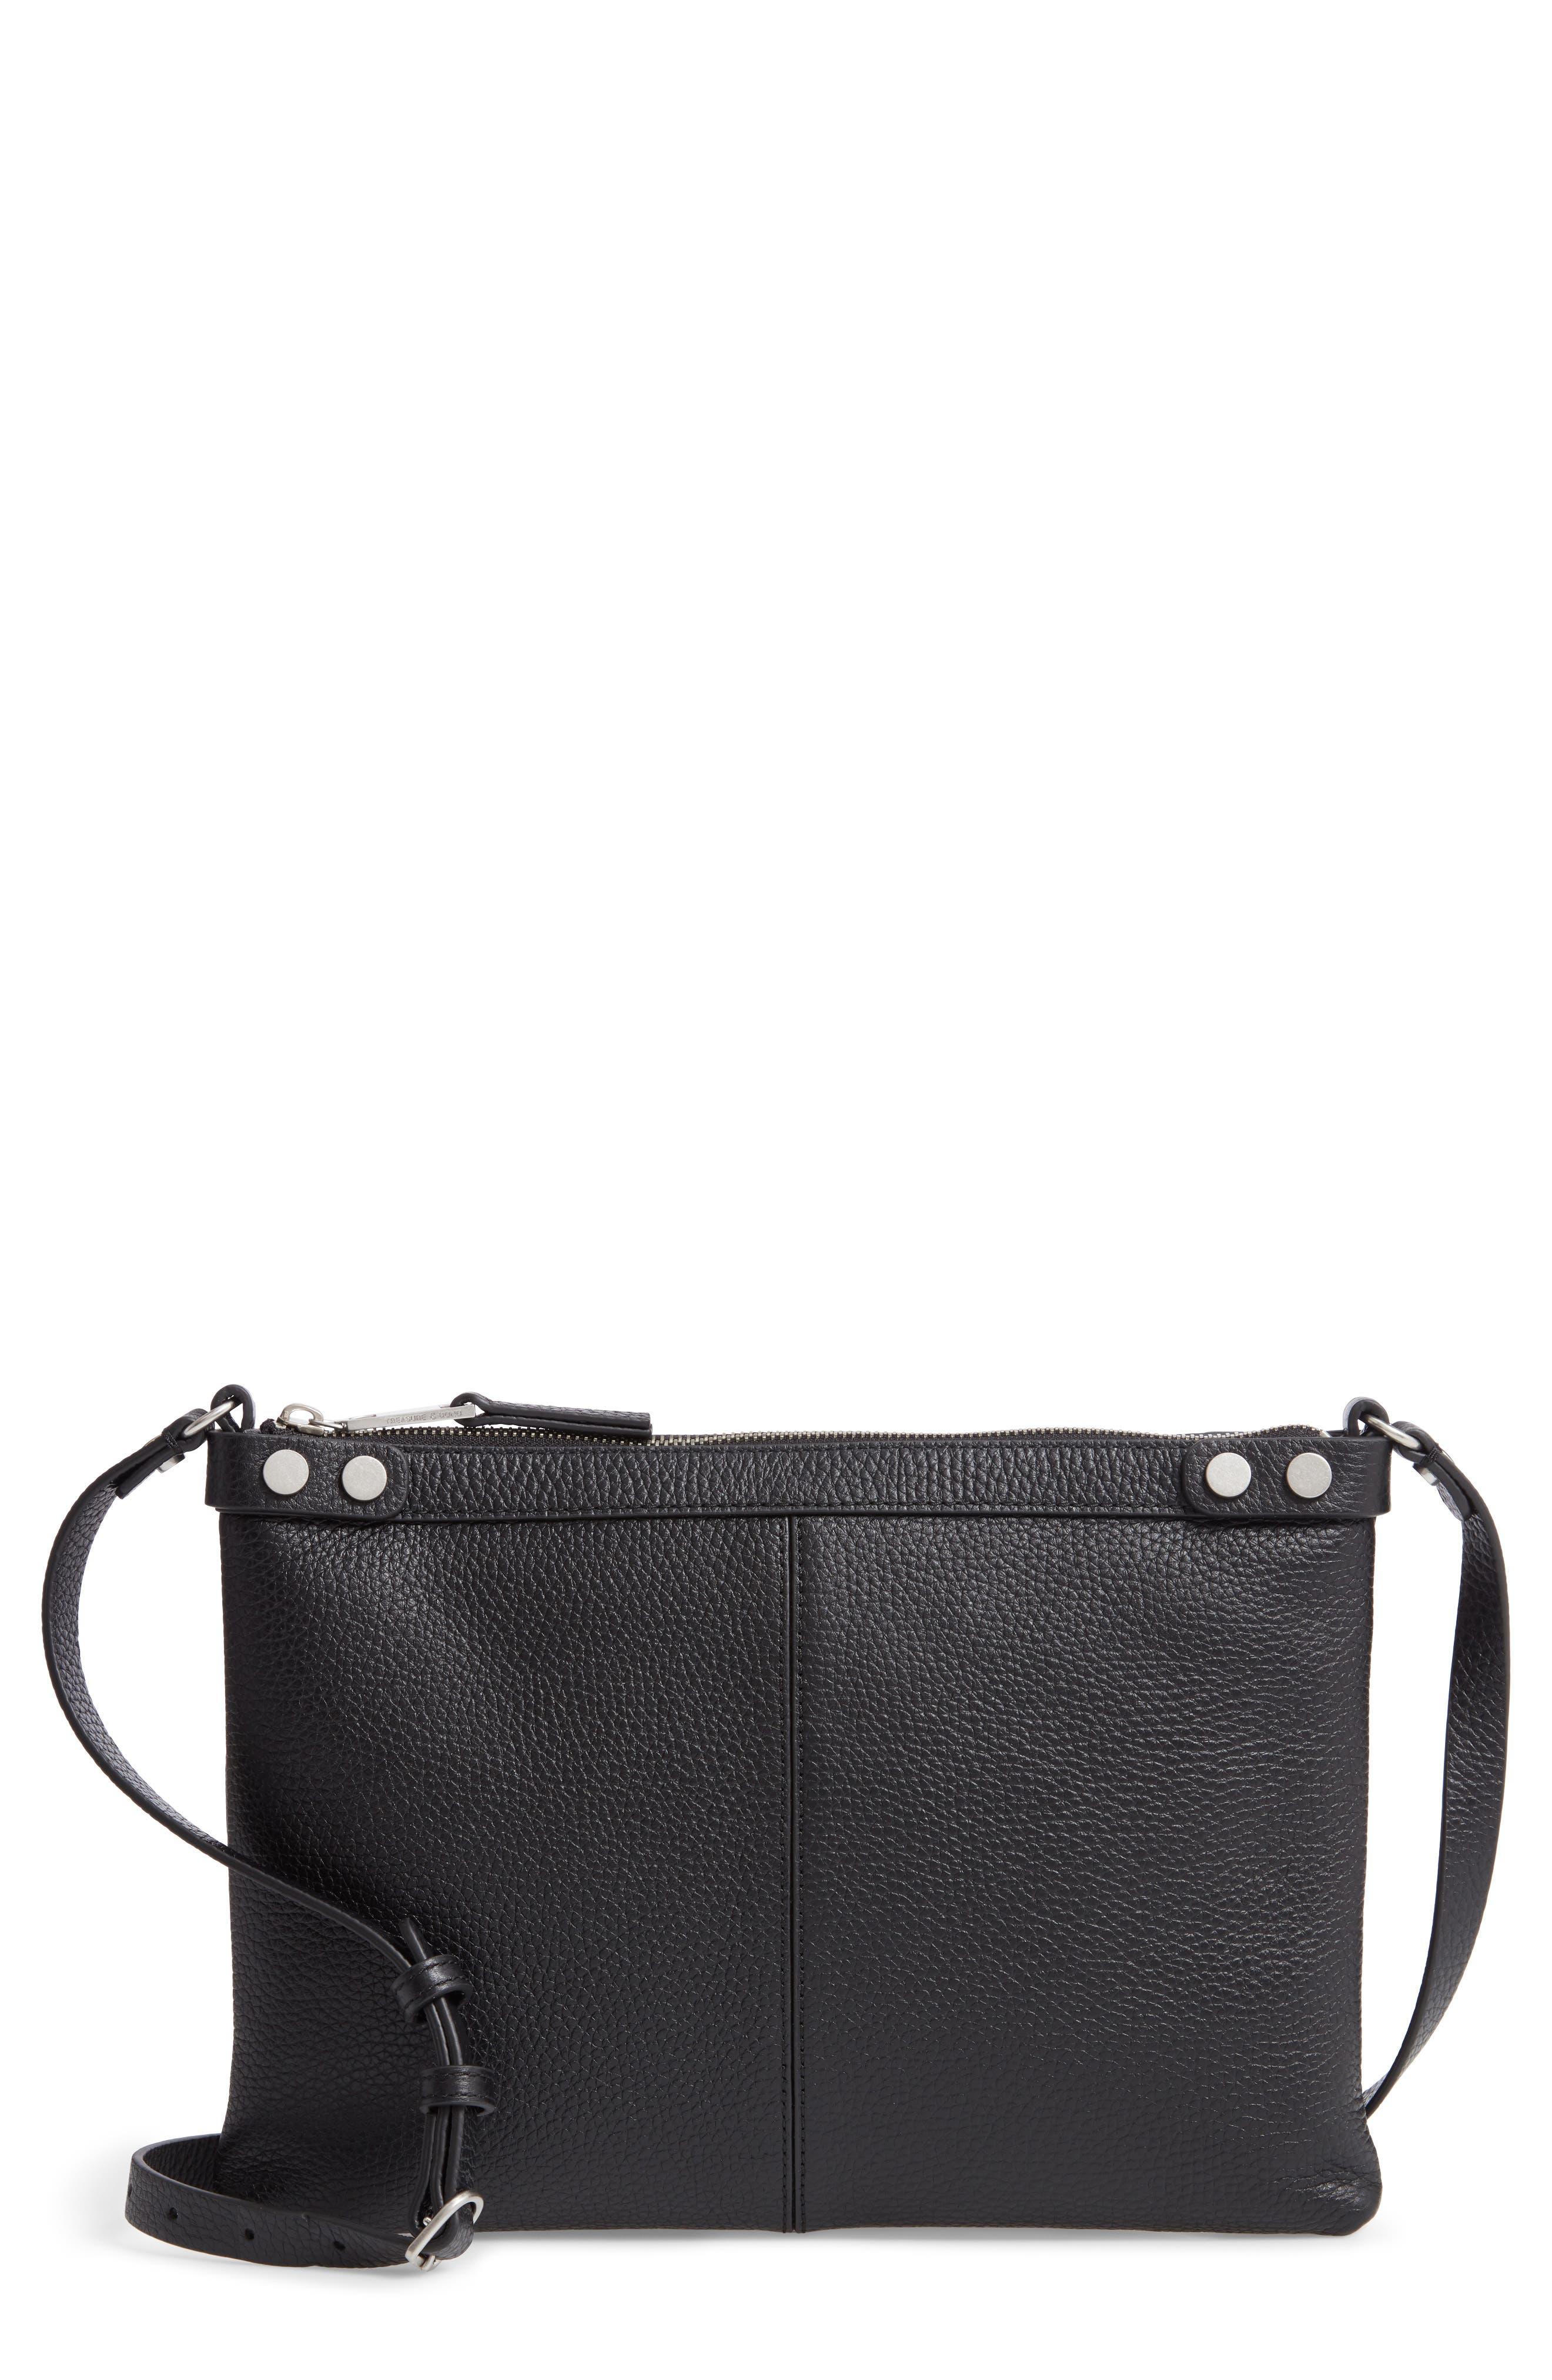 336bfe202279 Treasure   Bond Handbags   Wallets for Women